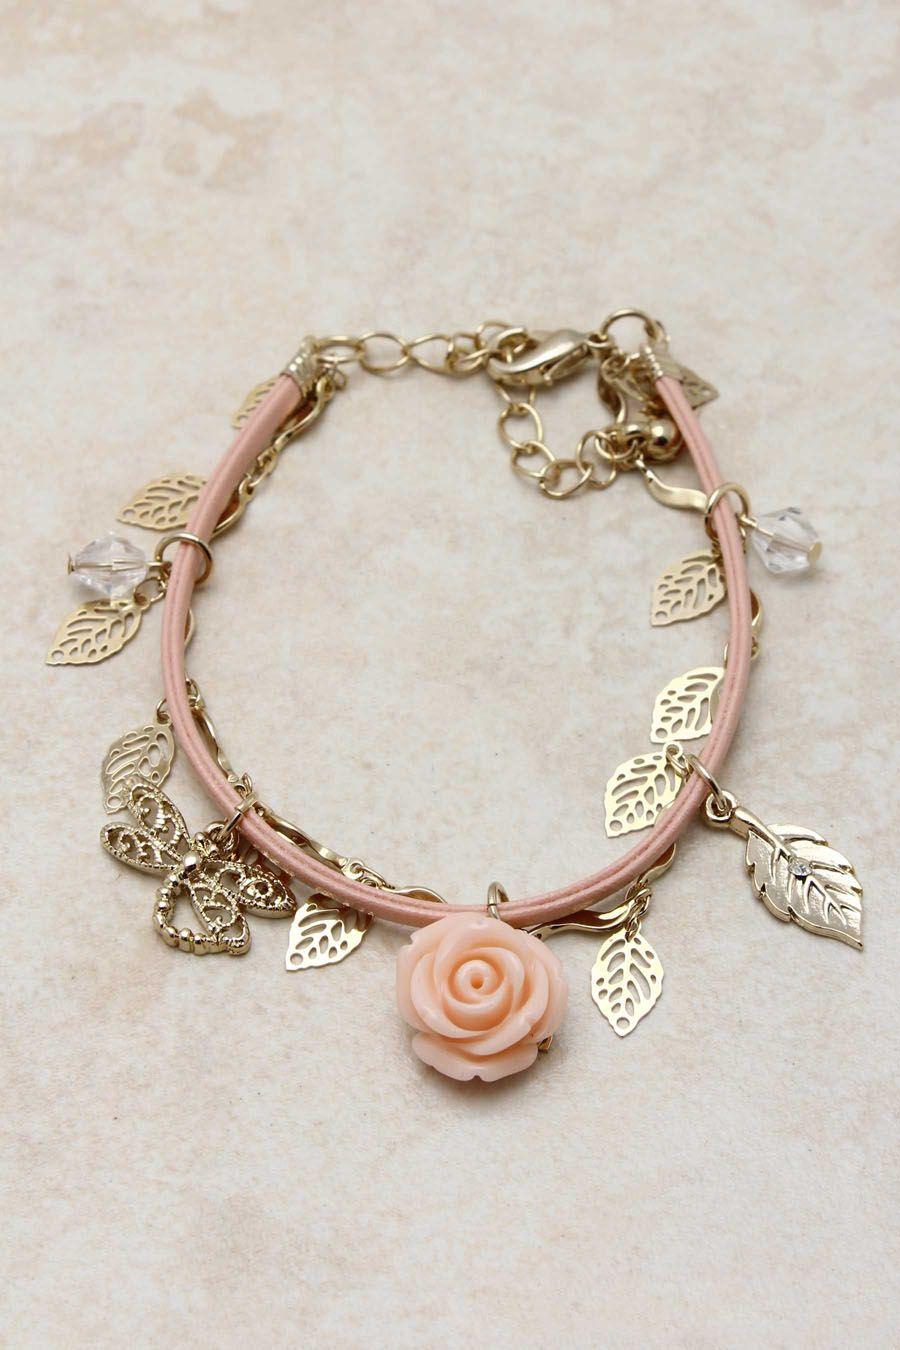 7756f45b0420c Blush Shimmering Rose Charm Bracelet   Emma Stine Jewelry Set   pulseiradeouro  pulseirasdeouro  pulseiras  pulseira